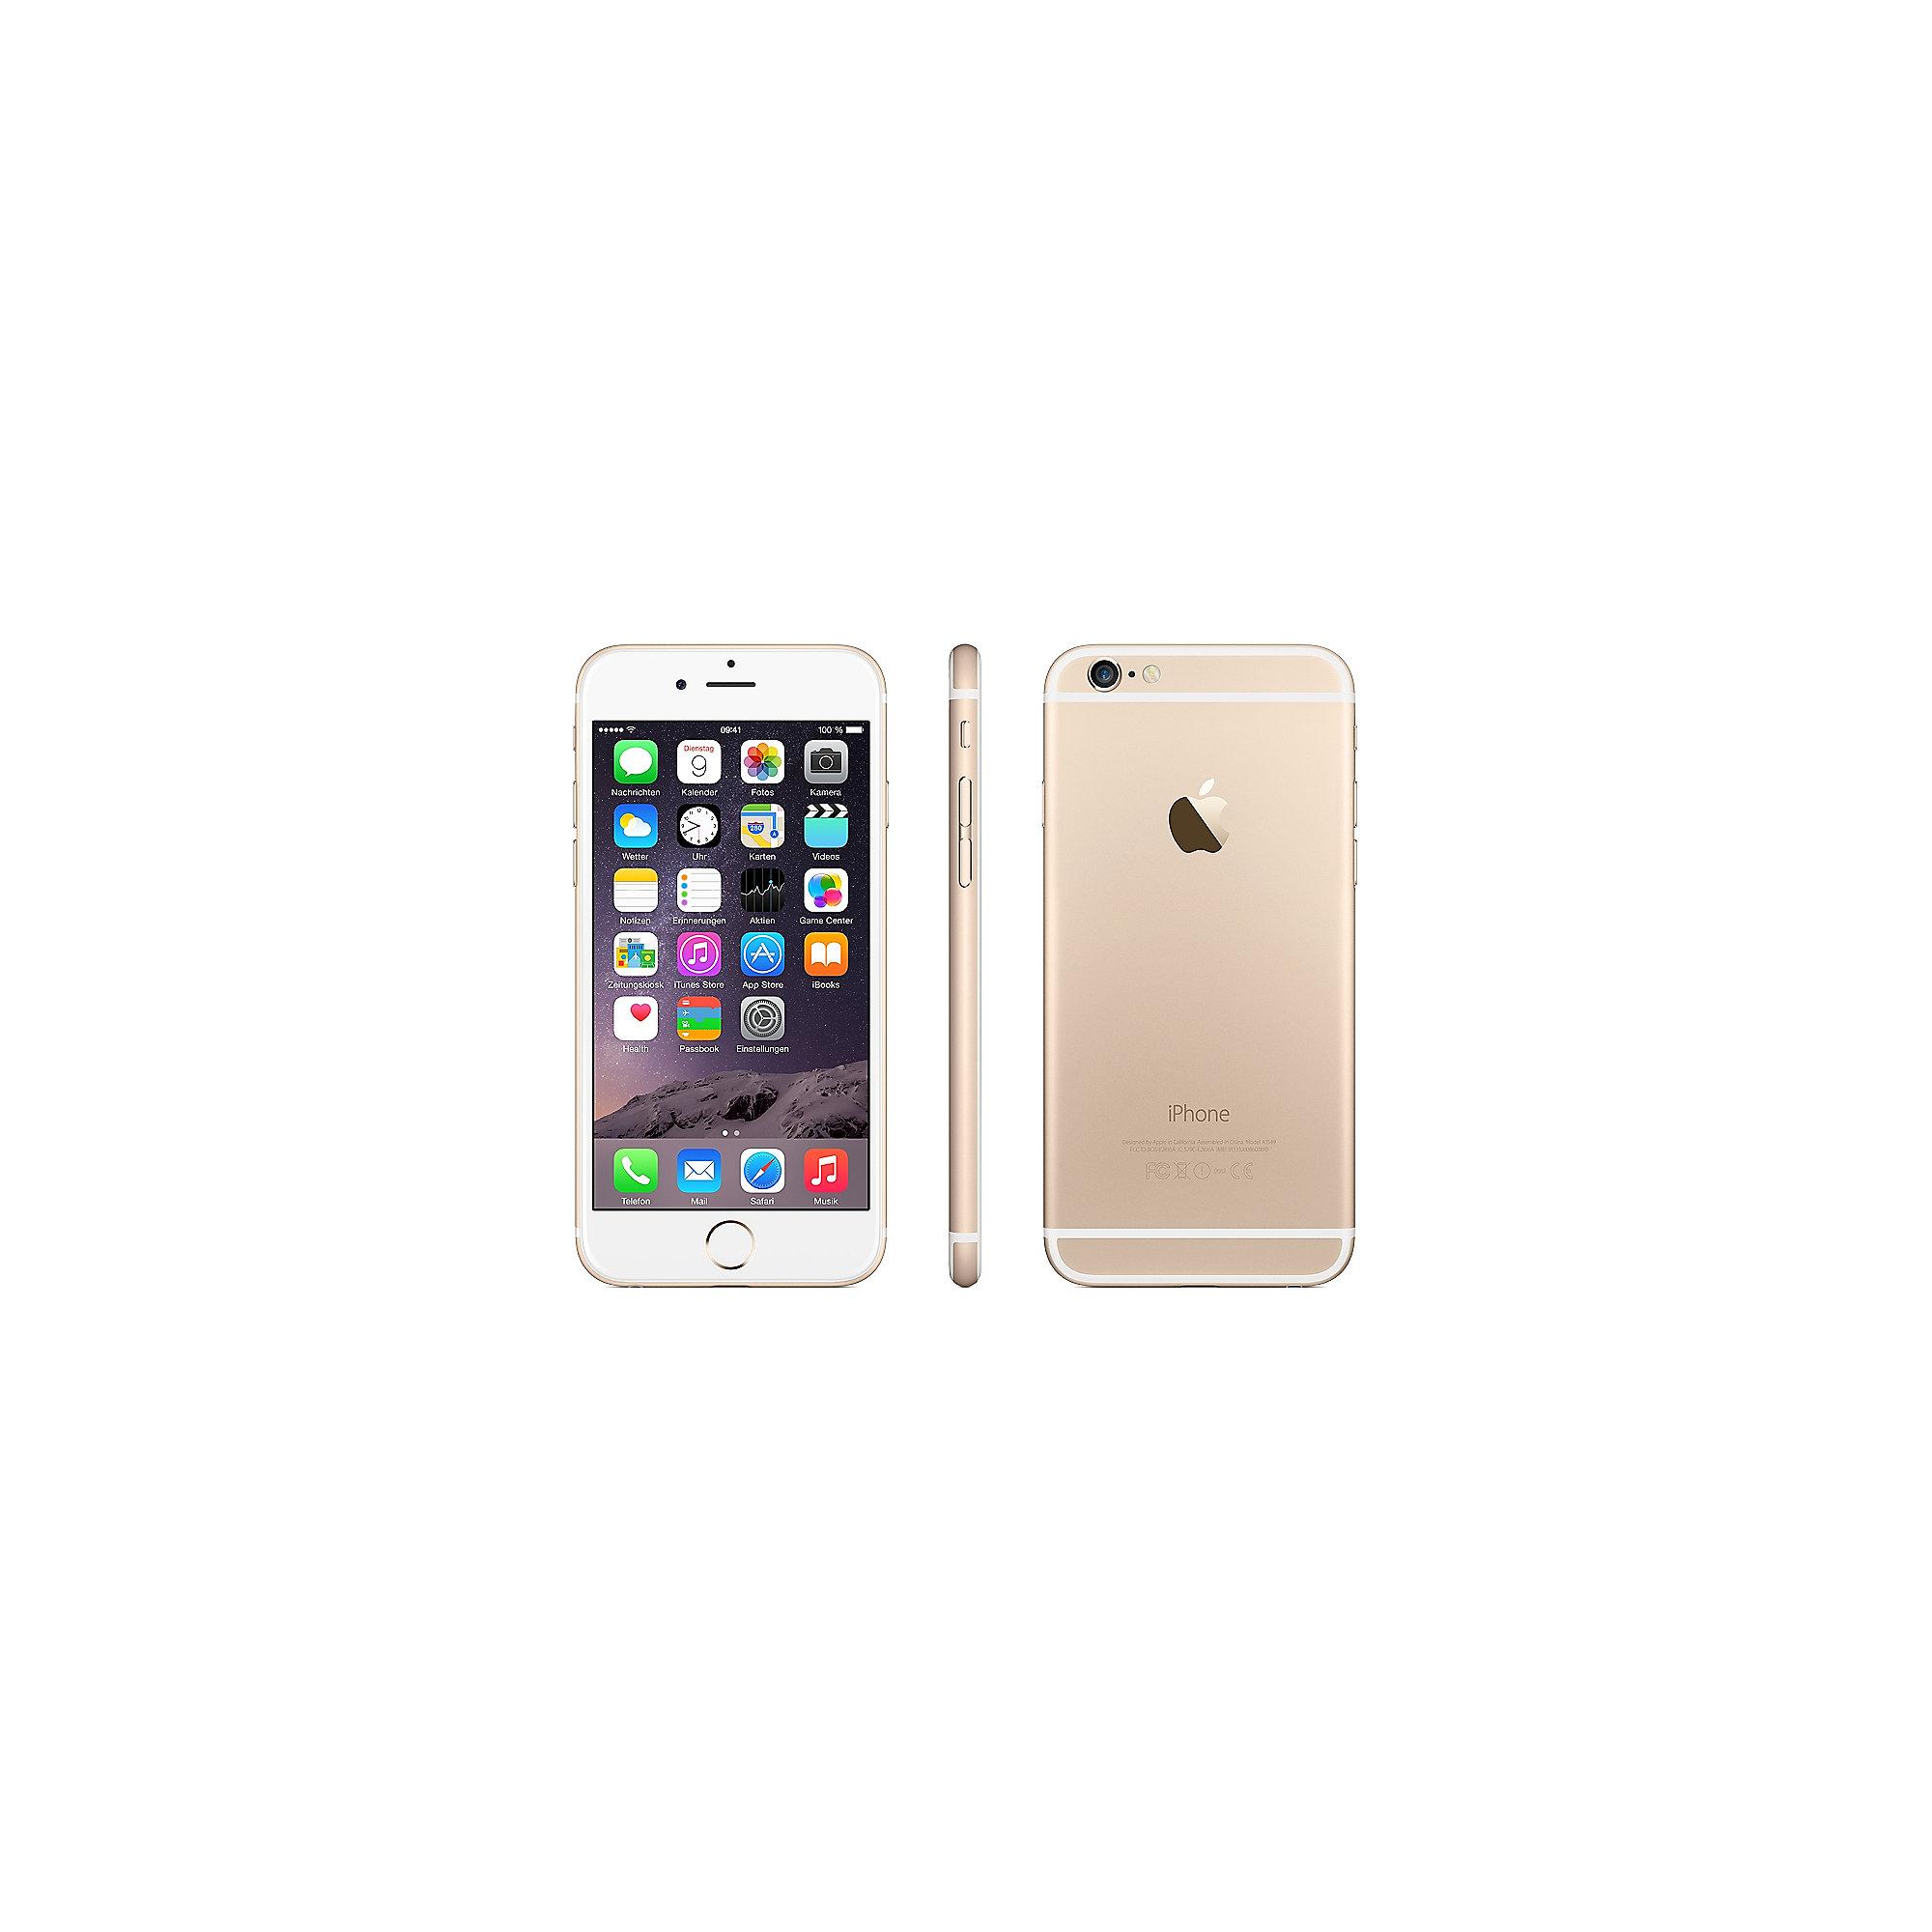 apple iphone 6s 16 gb gold renewd cyberport. Black Bedroom Furniture Sets. Home Design Ideas